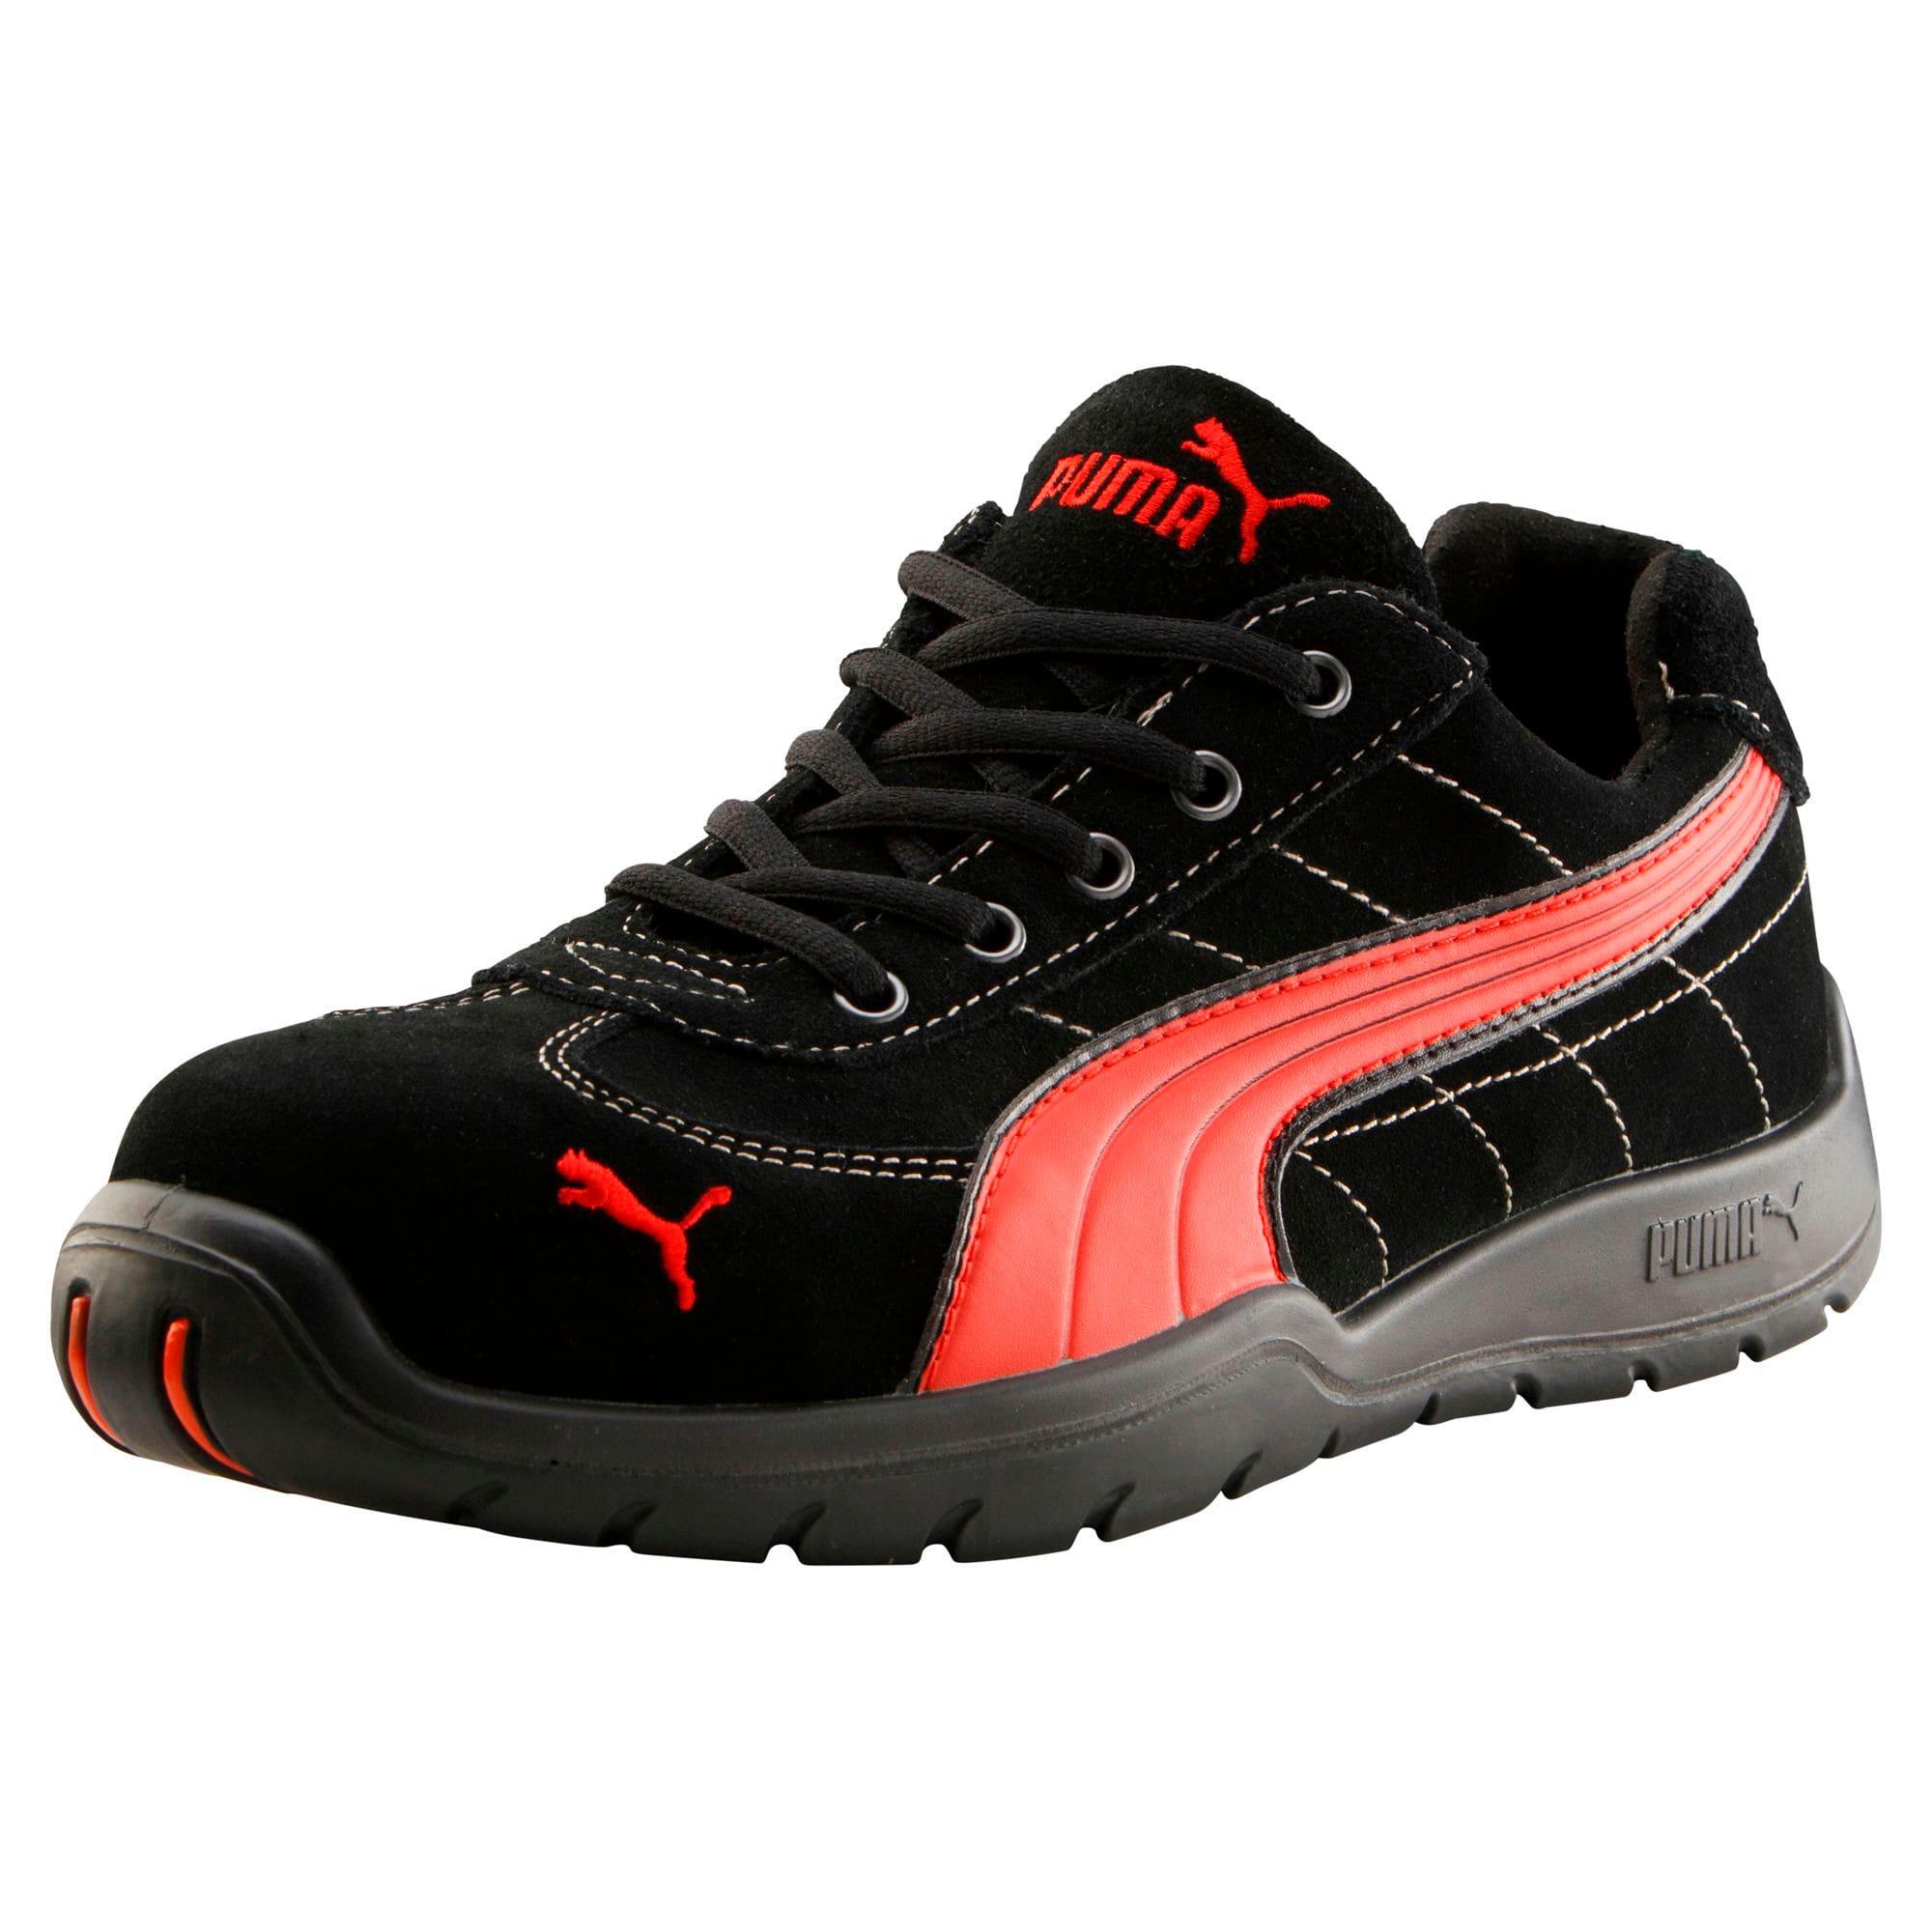 Thumbnail 1 van S1P HRO Moto Protect Safety Shoes, zwart-rood, medium